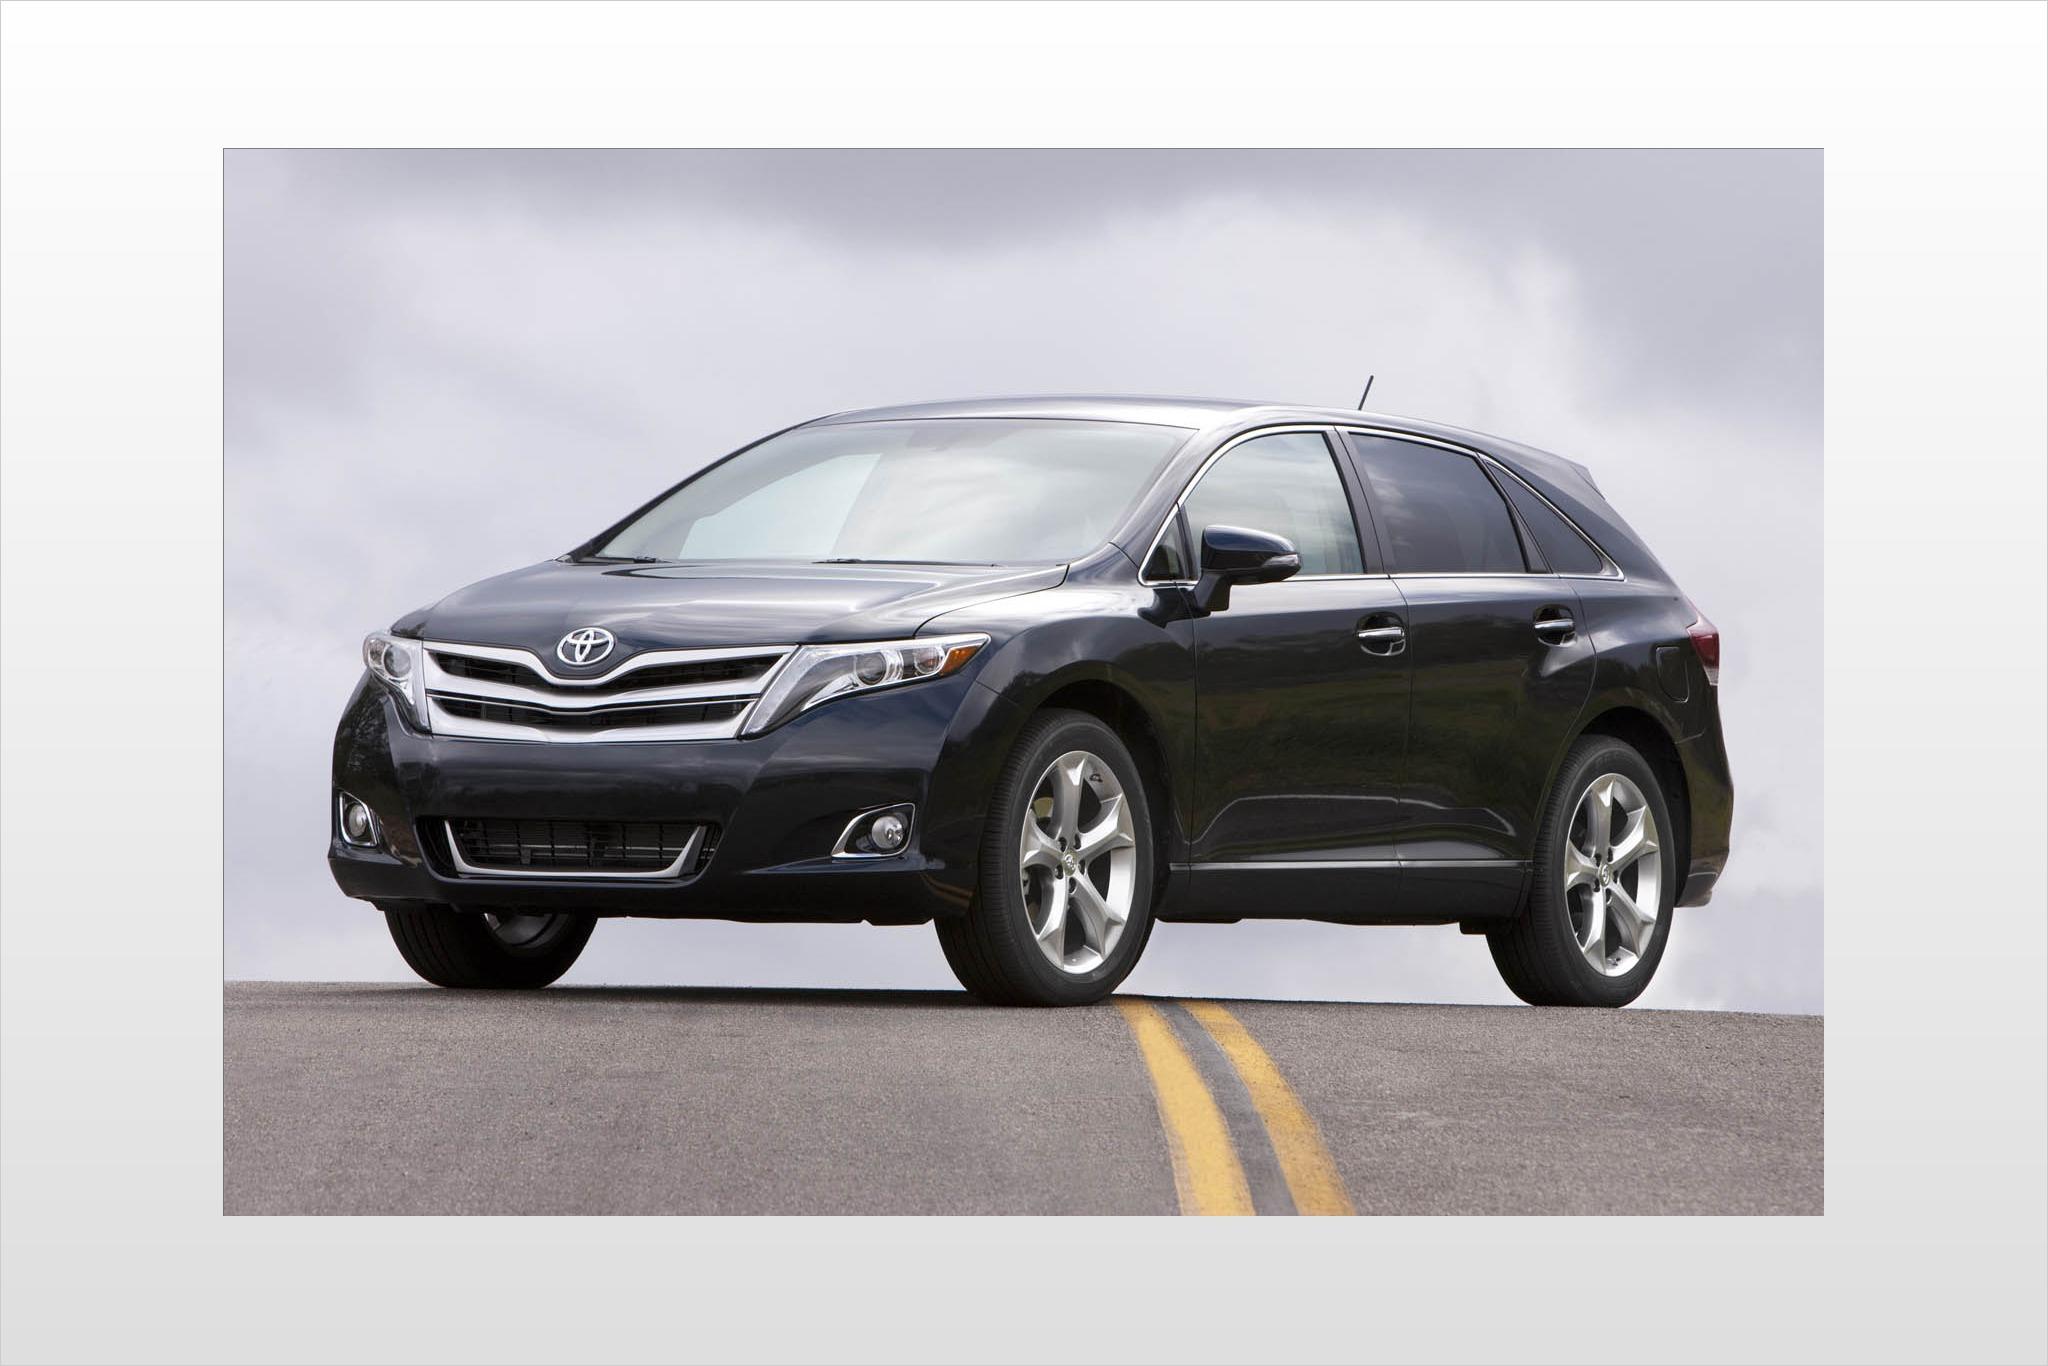 2013 toyota venza wagon limited fq oem 1 2048